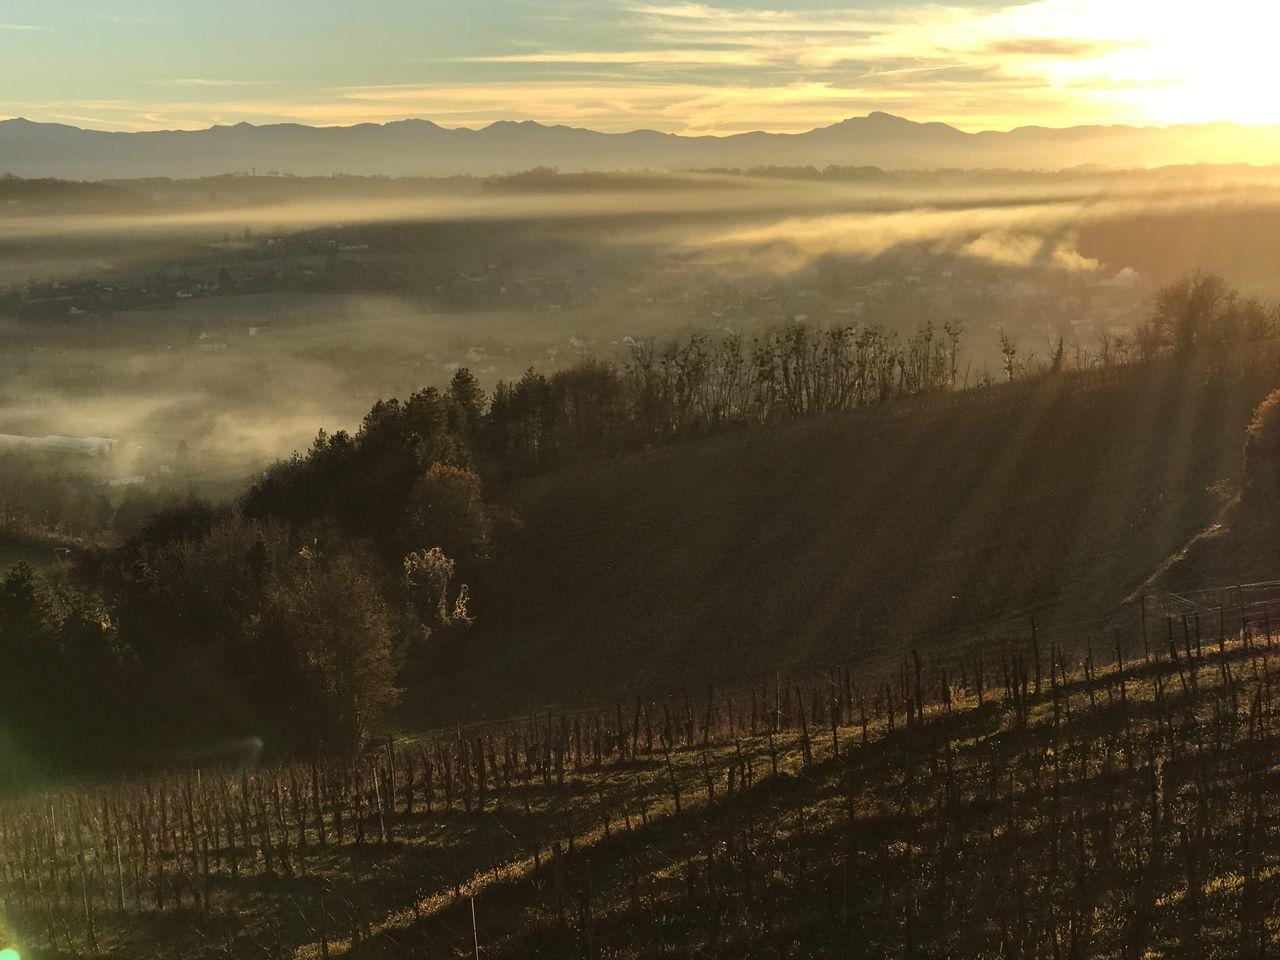 Jurançon Pyrenees Vignes Mountain No People Agriculture Fog Landscape Nature Beauty In Nature Scenics Sunset Outdoors Vineyard